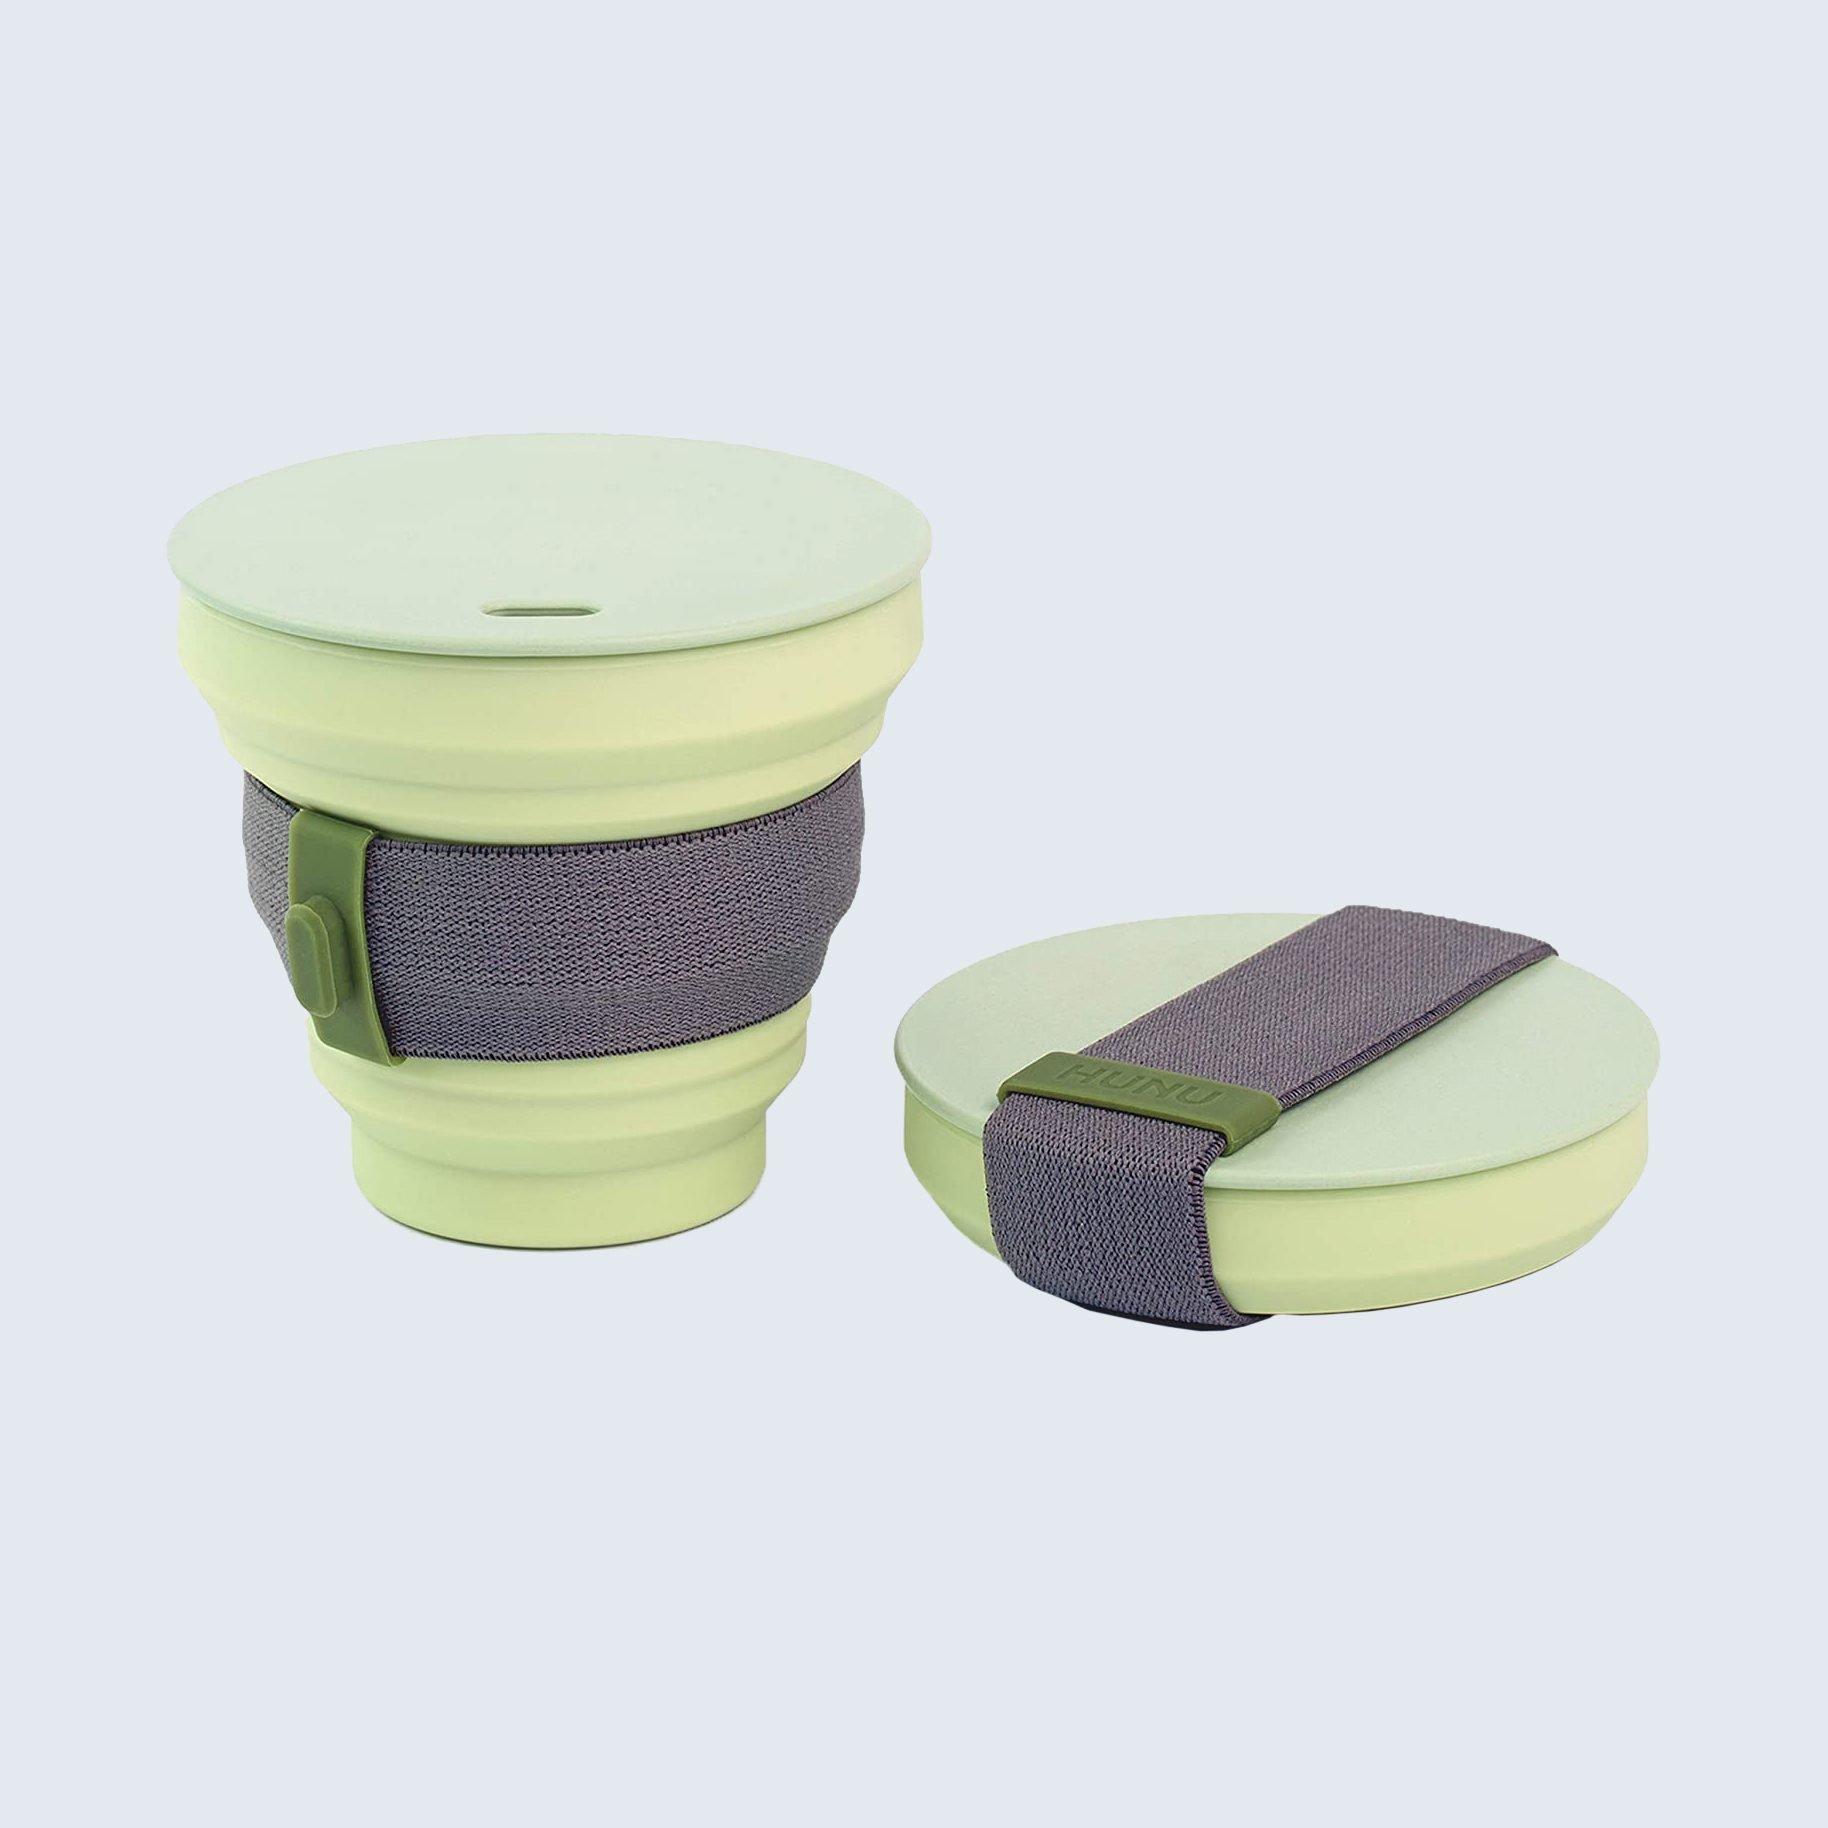 HUNU Collapsible Coffee Cup